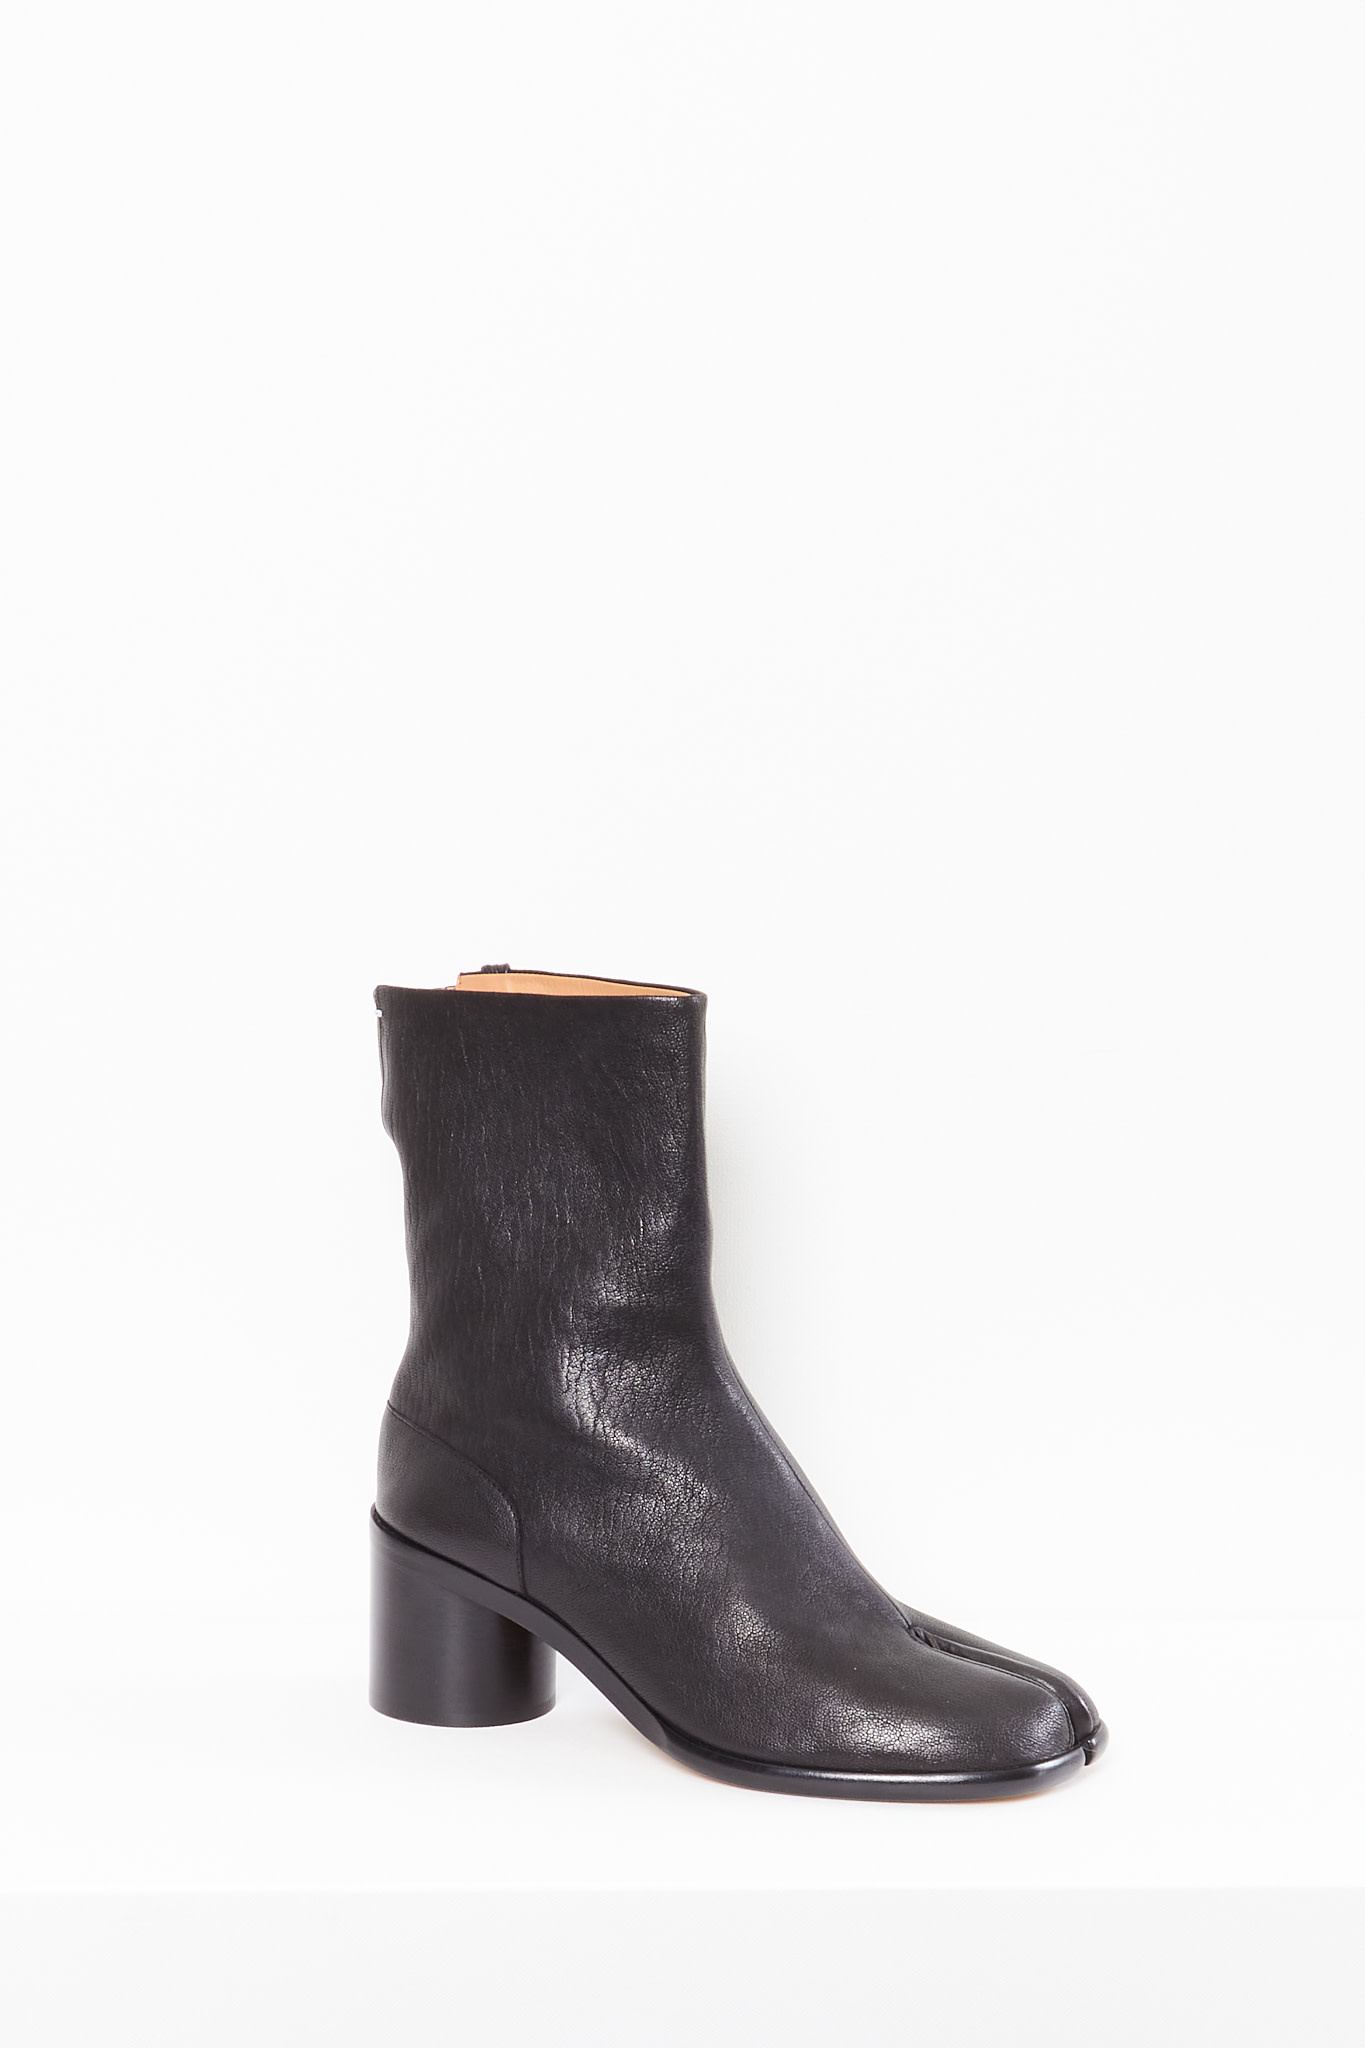 Maison Margiela MM ankle boot